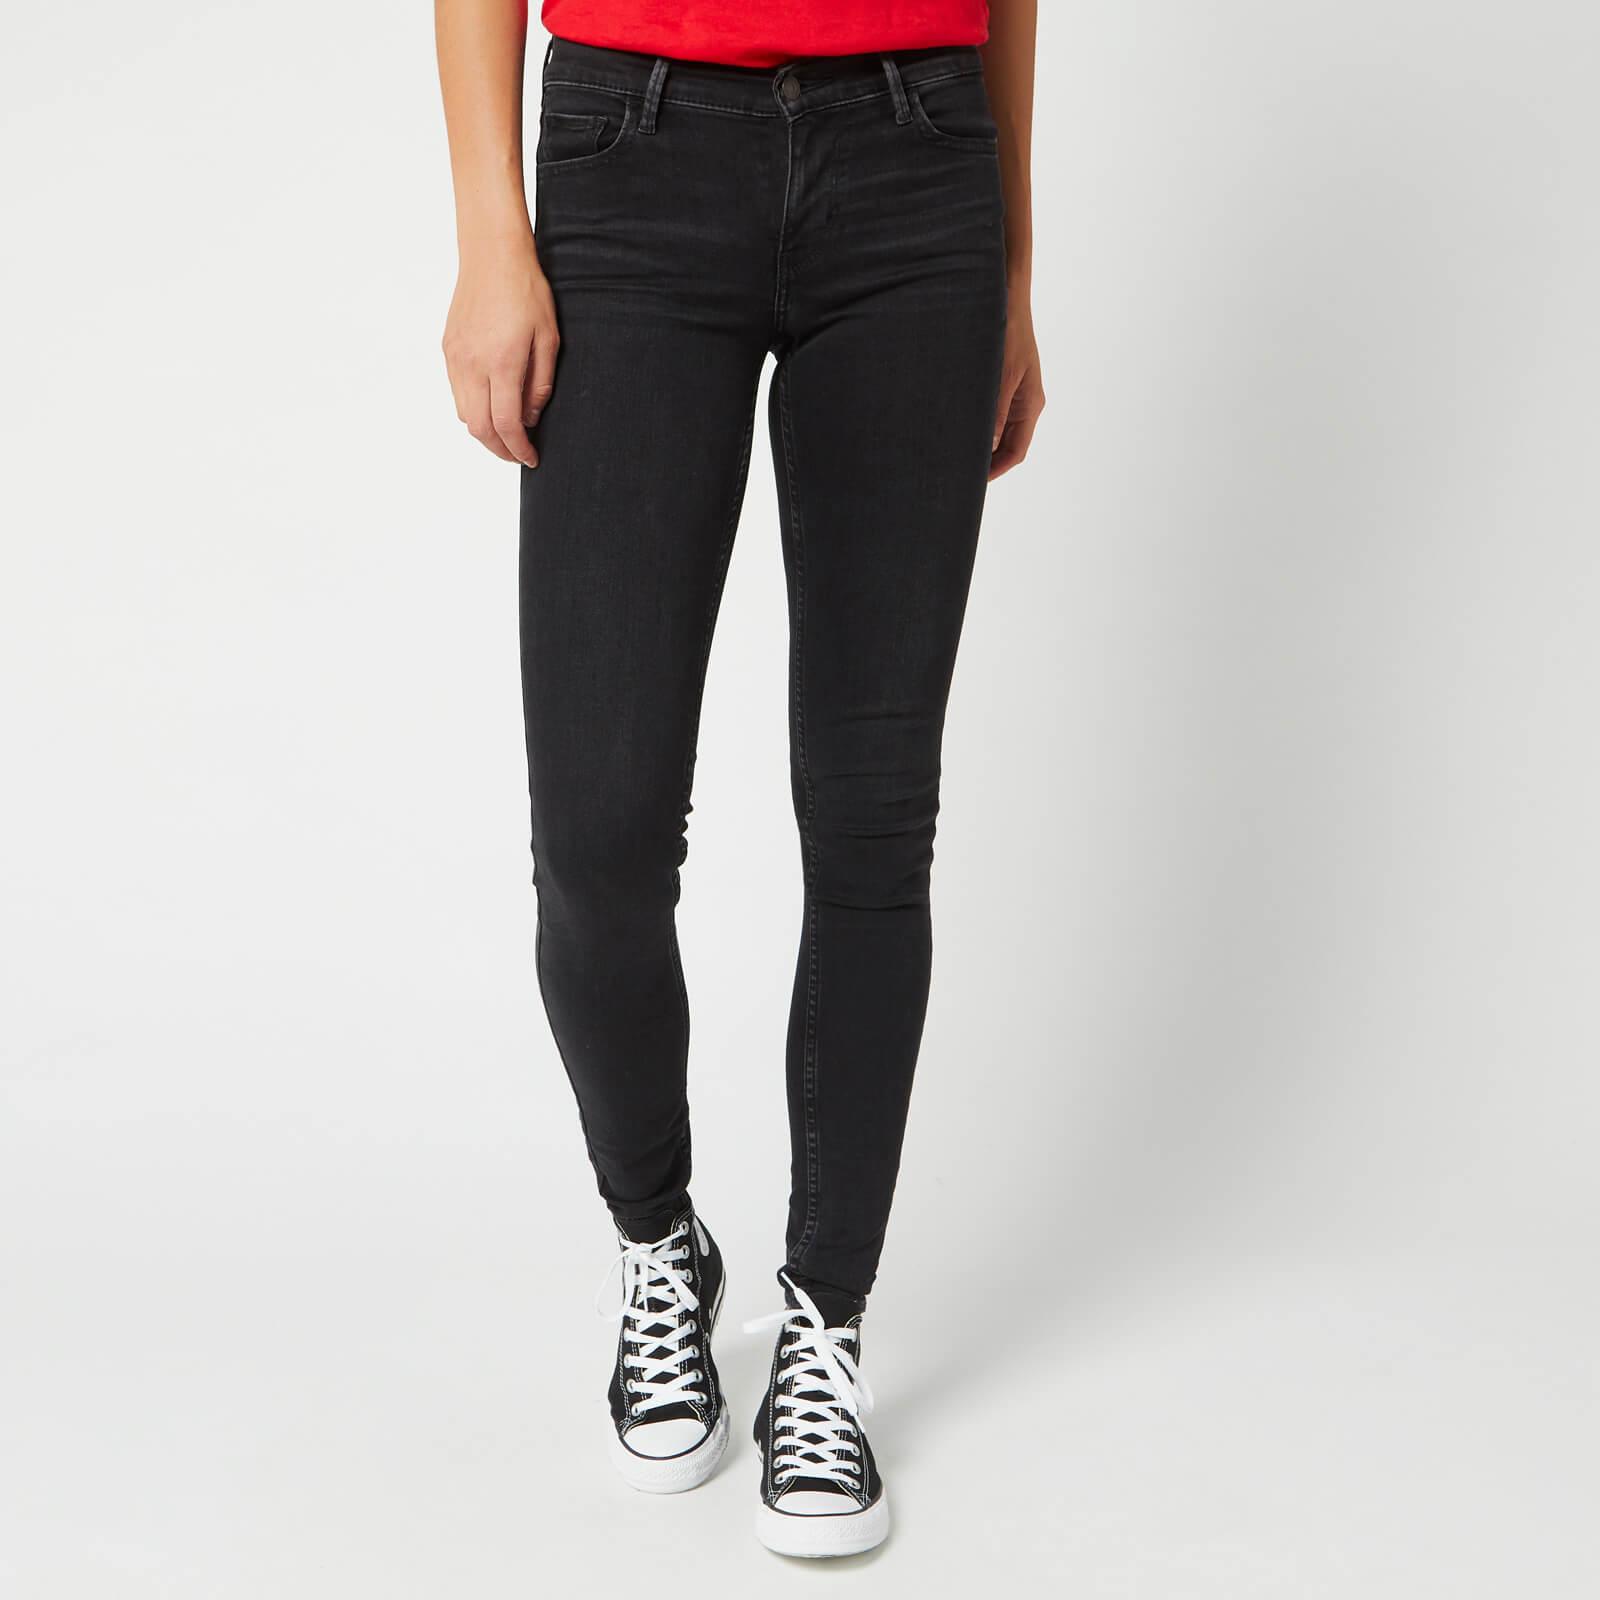 Levi's s Innovation Super Skinny Jeans - Freak Out - W28/L32